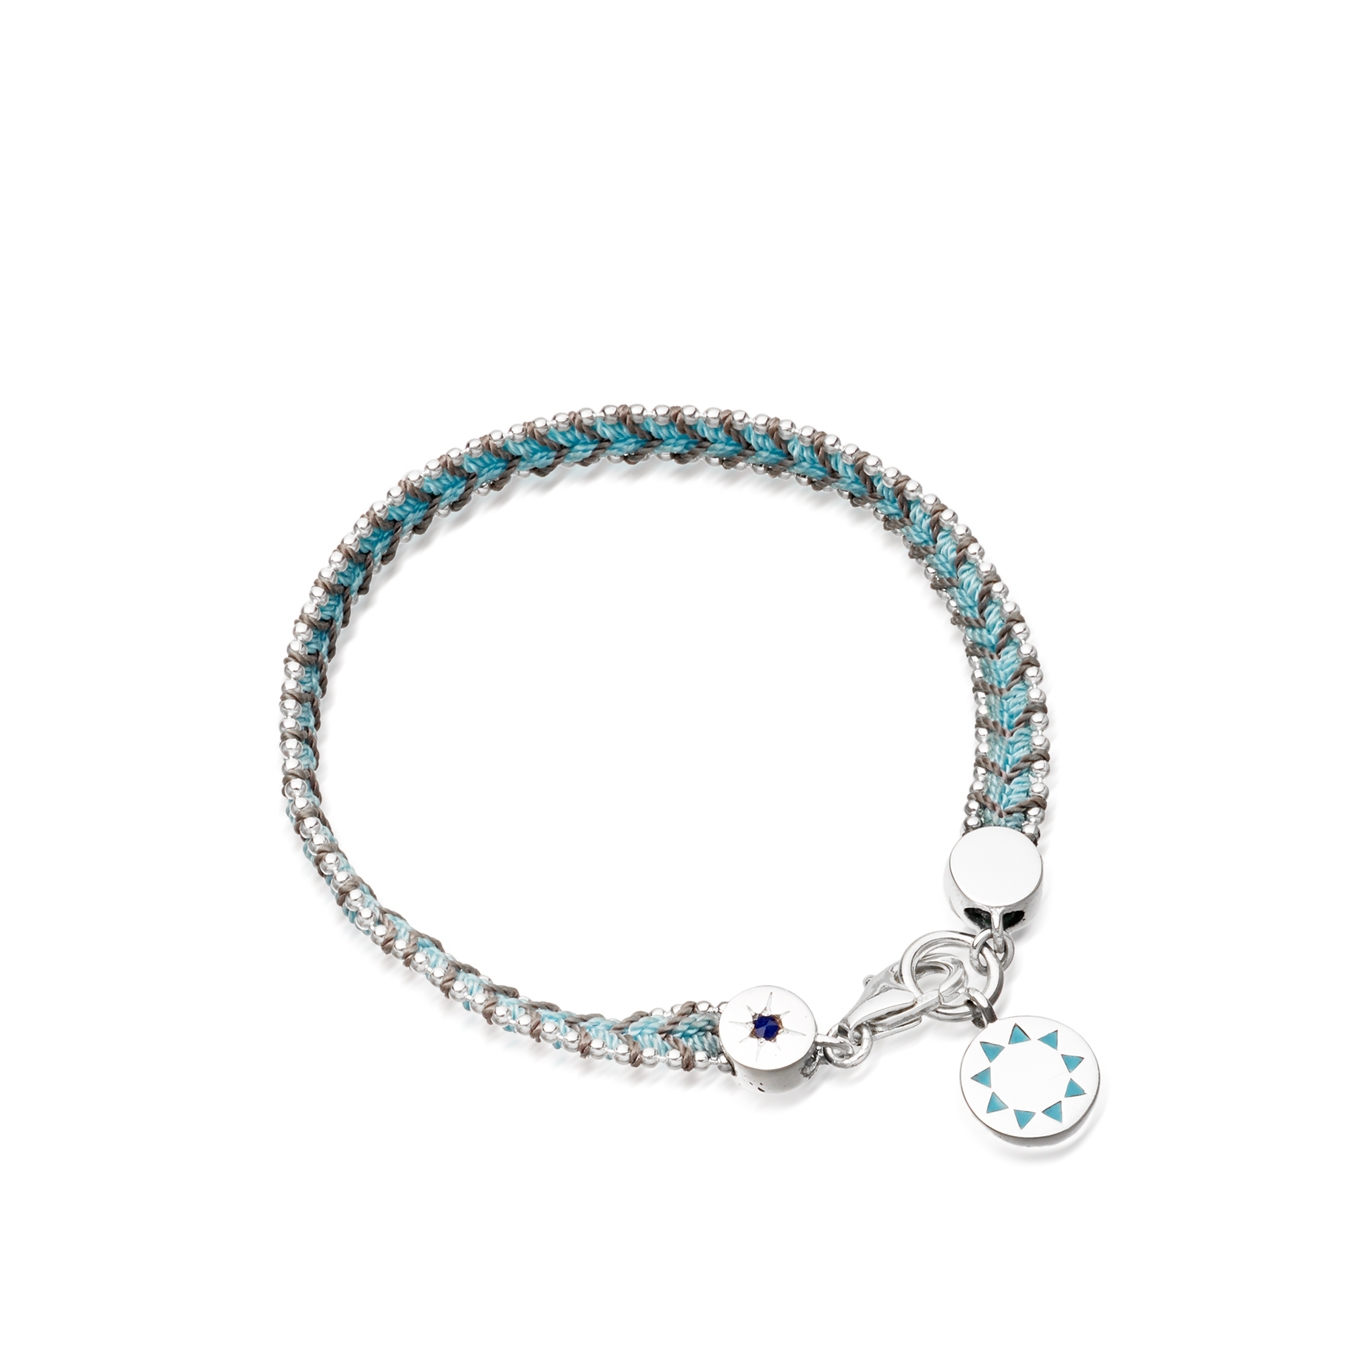 Theirworld Children Biography Charity Bracelet